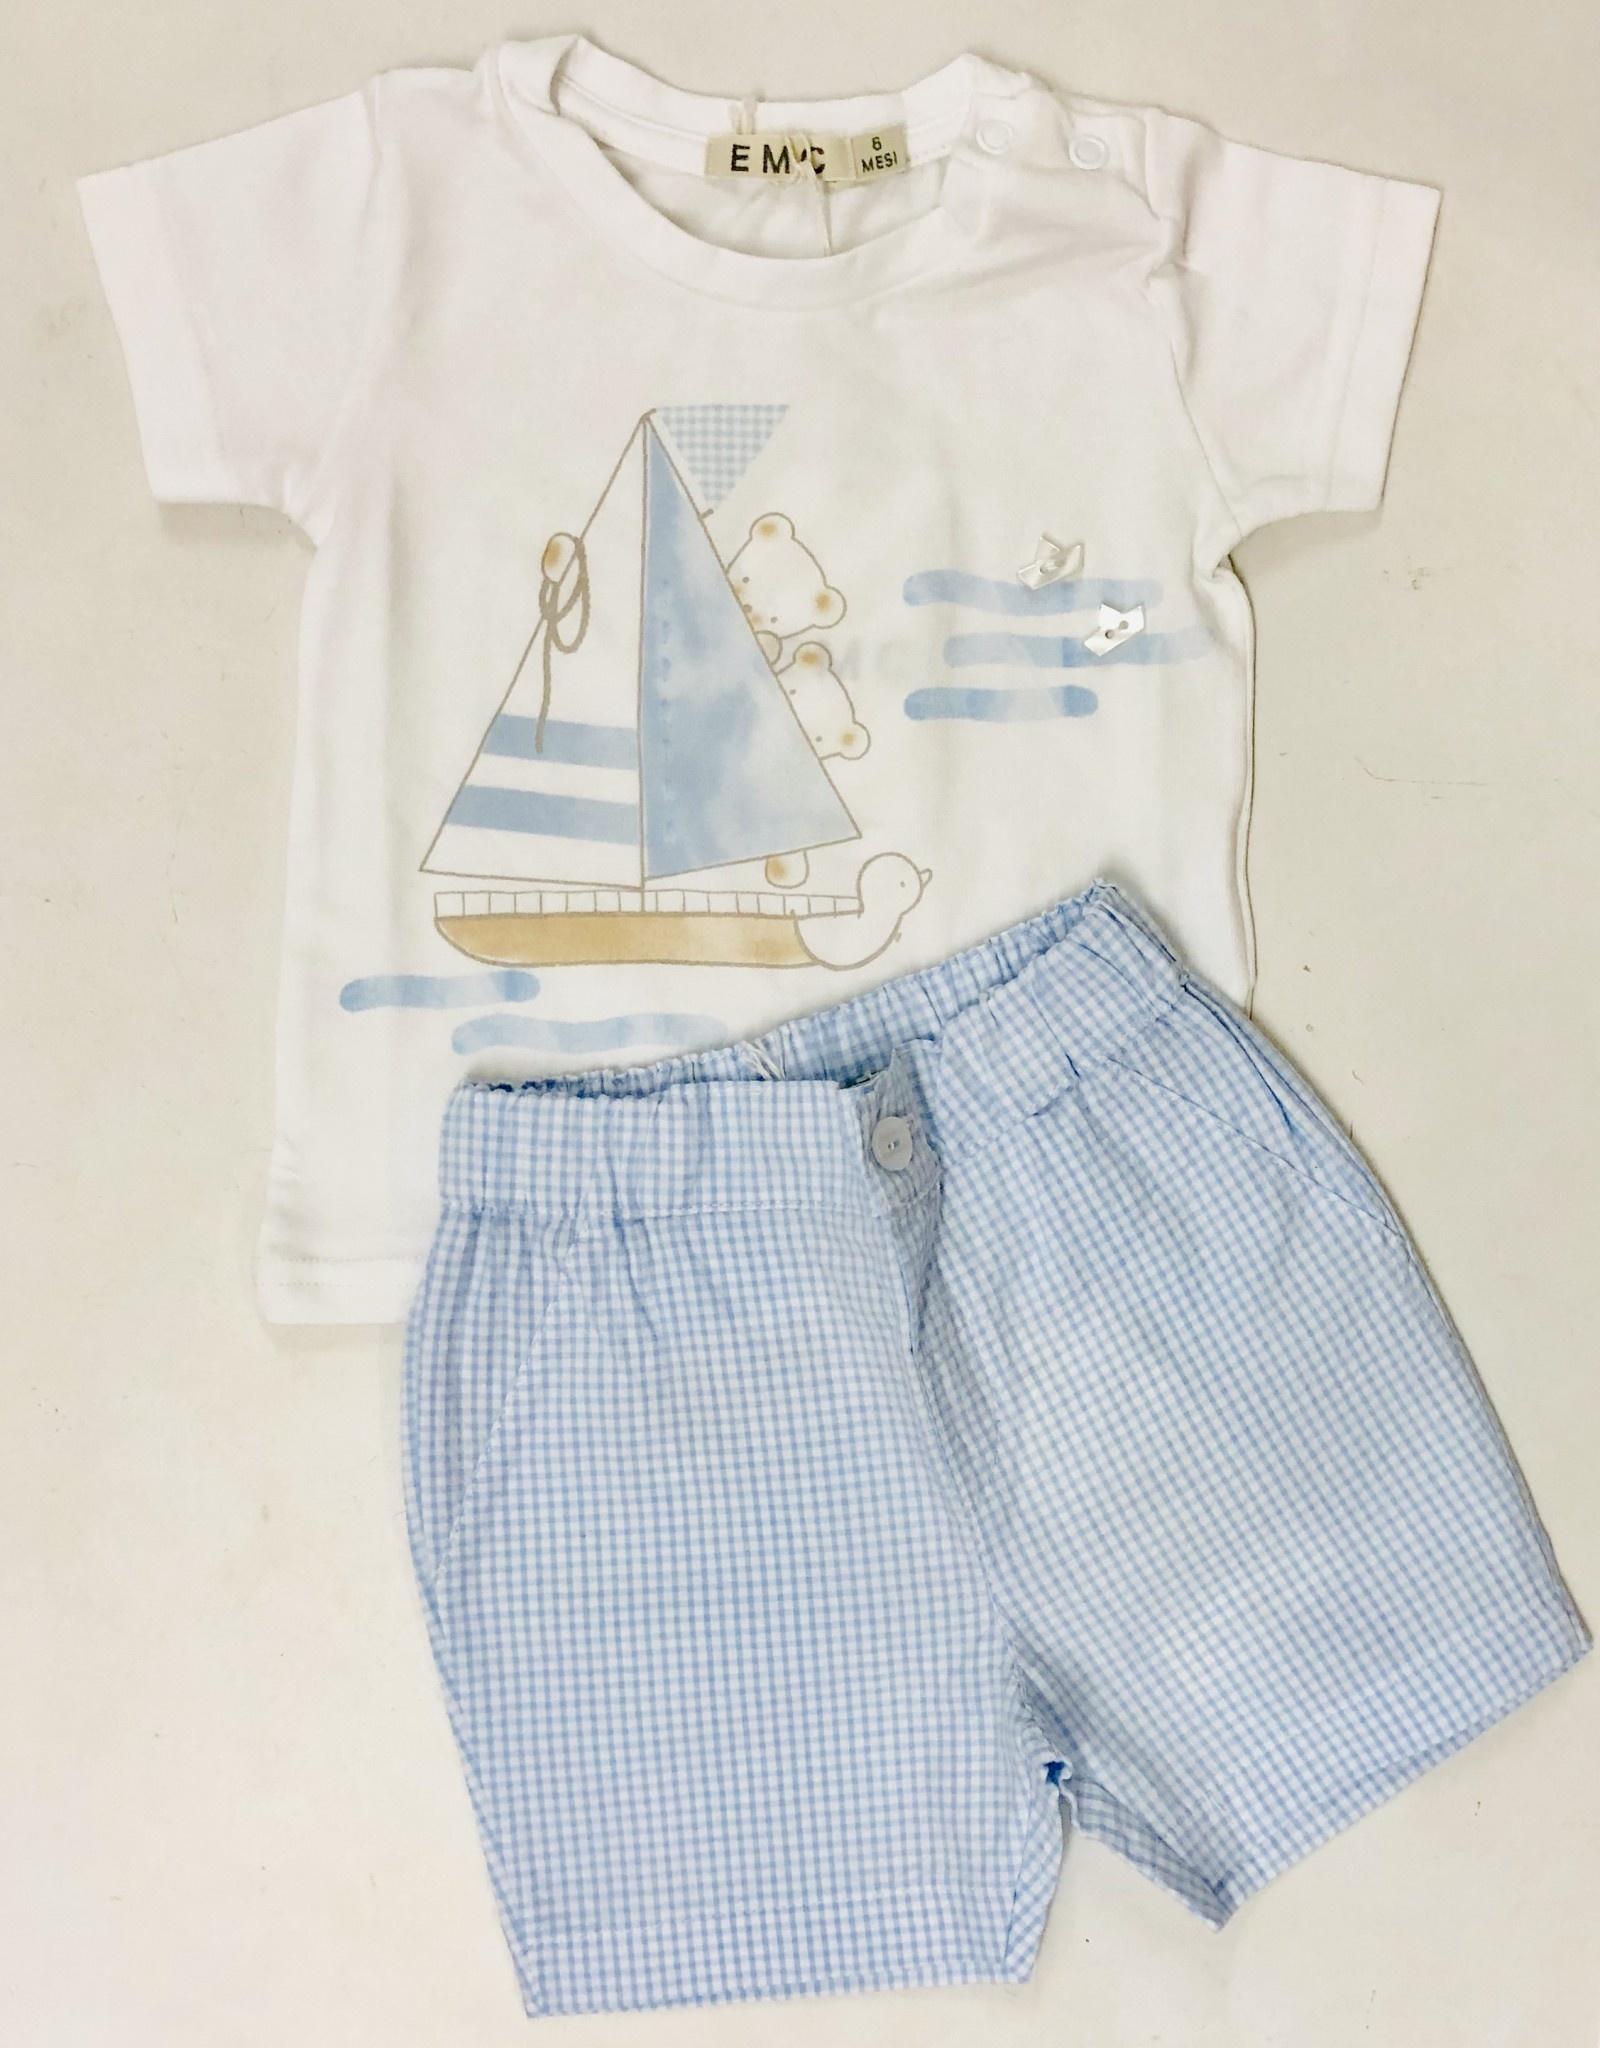 EMC EMC Teddy T-Shirt and Check Poplin Shorts Set 6MONTHS